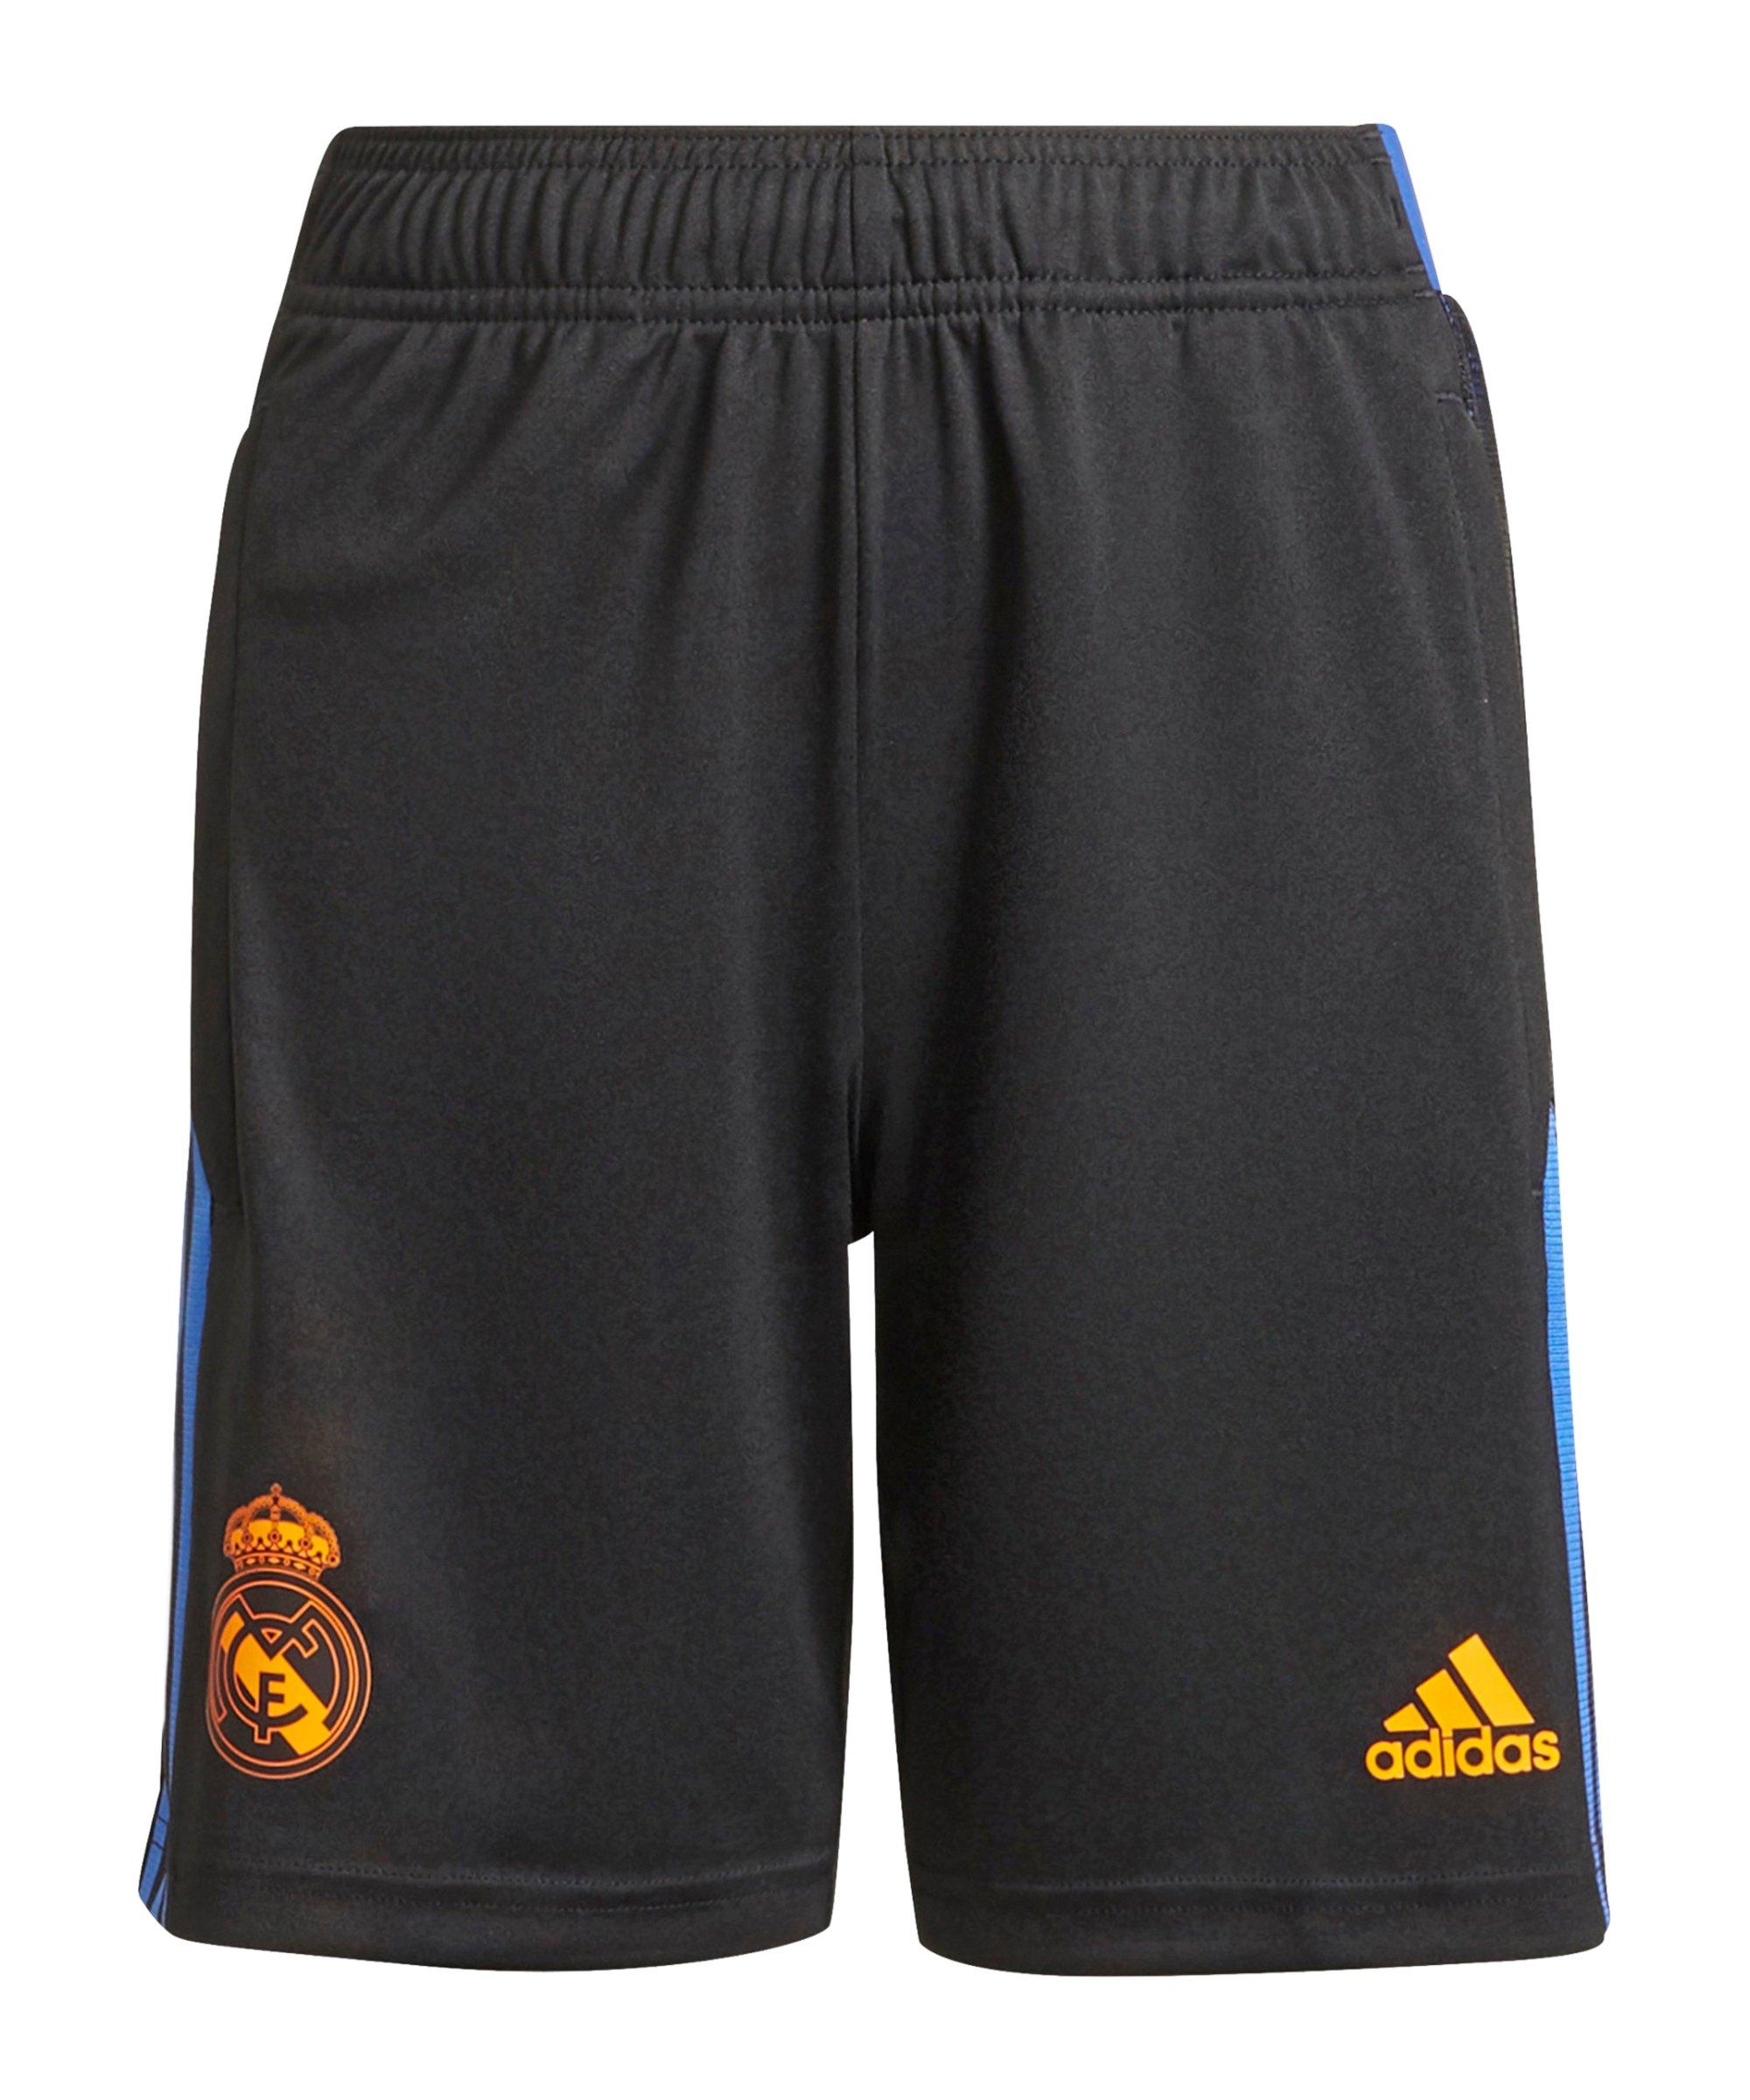 adidas Real Madrid Trainingsshort Kids Schwarz - schwarz